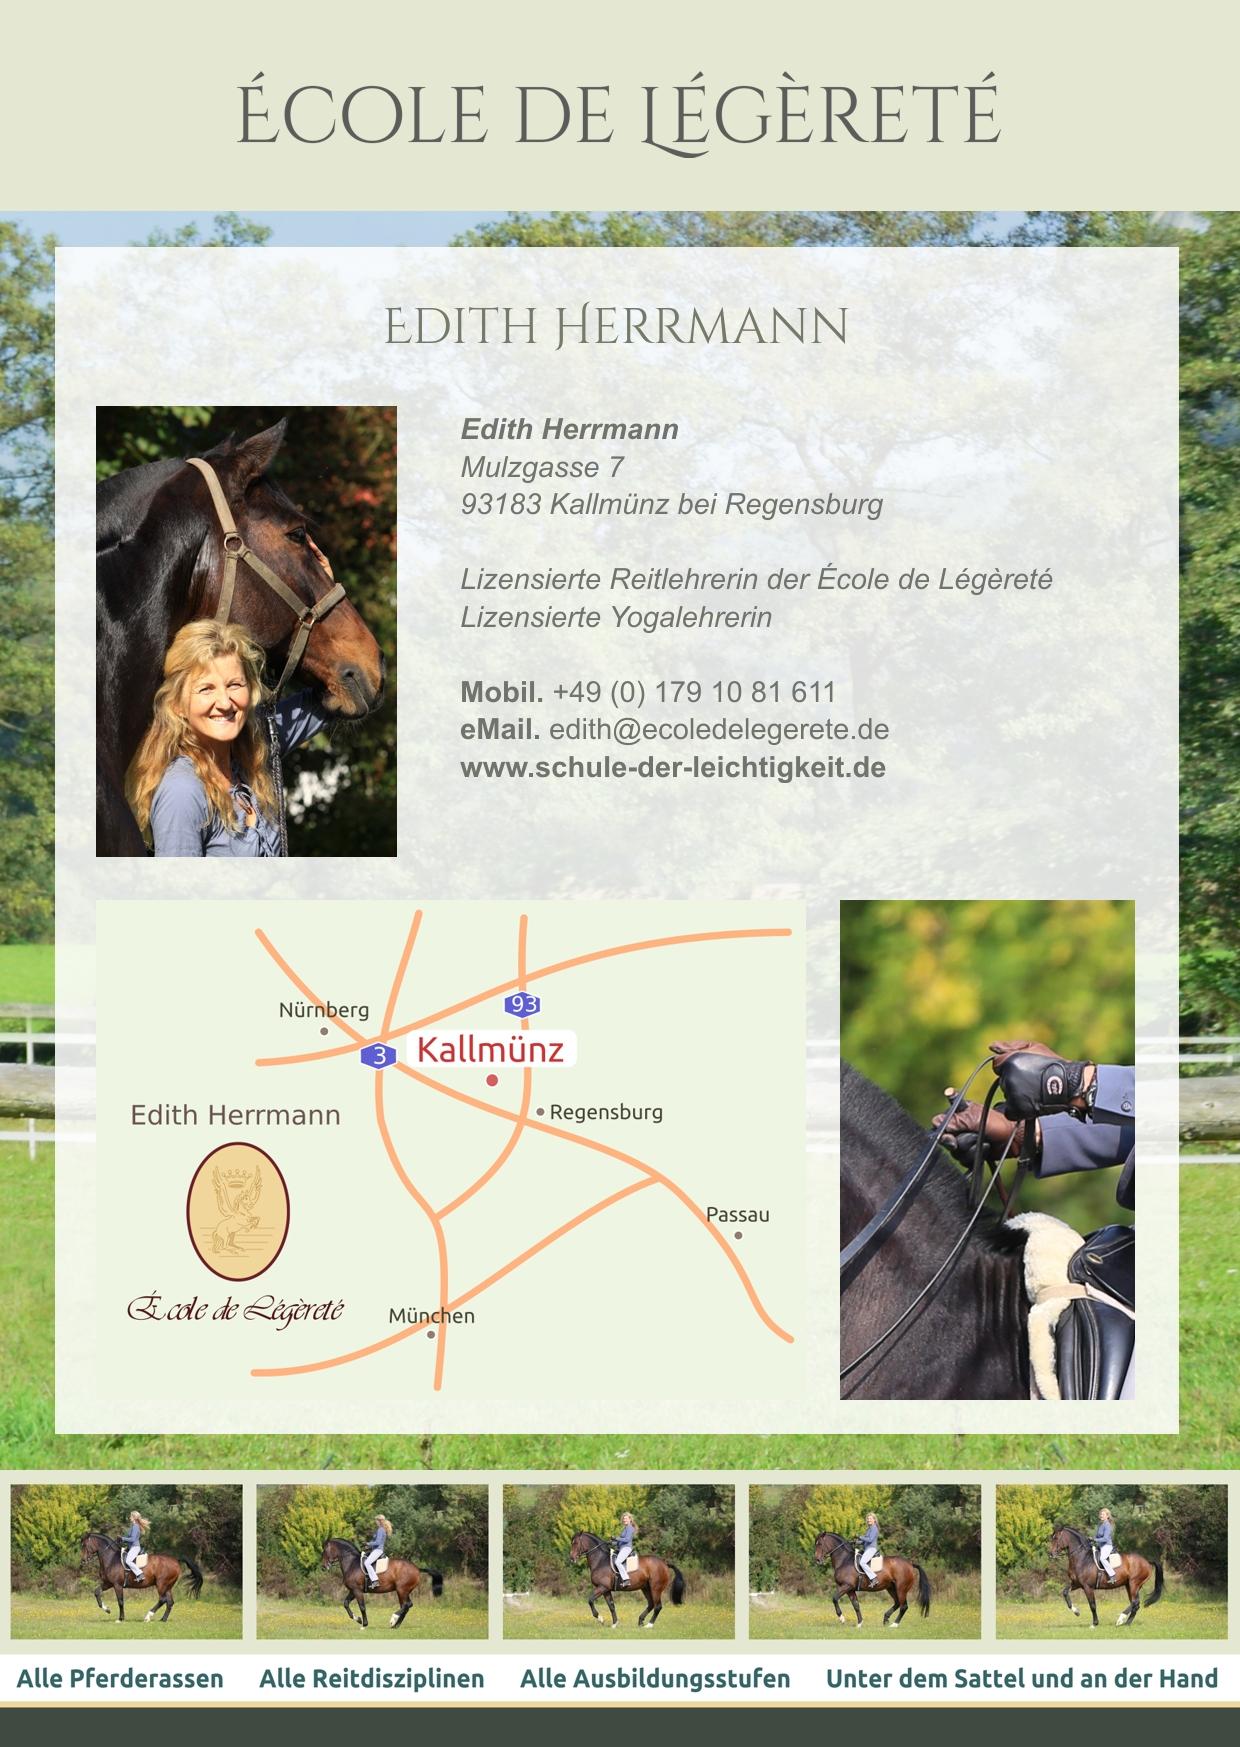 Schule der Légèreté mit Edith Herrmann, Bayern, Regensburg, Ostbayern